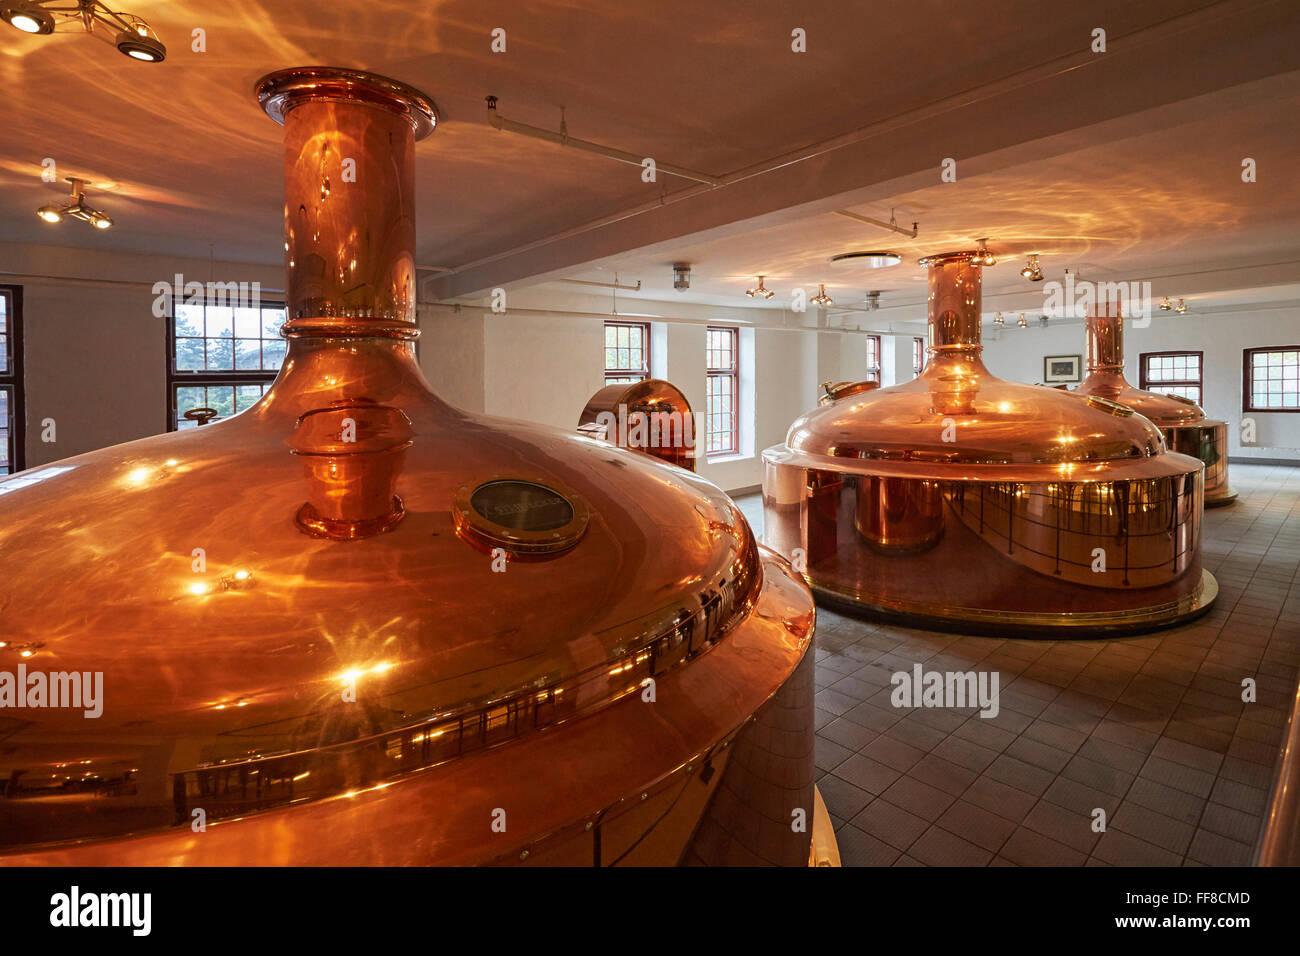 Copenhagen the Carlsberg Brewery museum copper brewing tanks - Stock Image